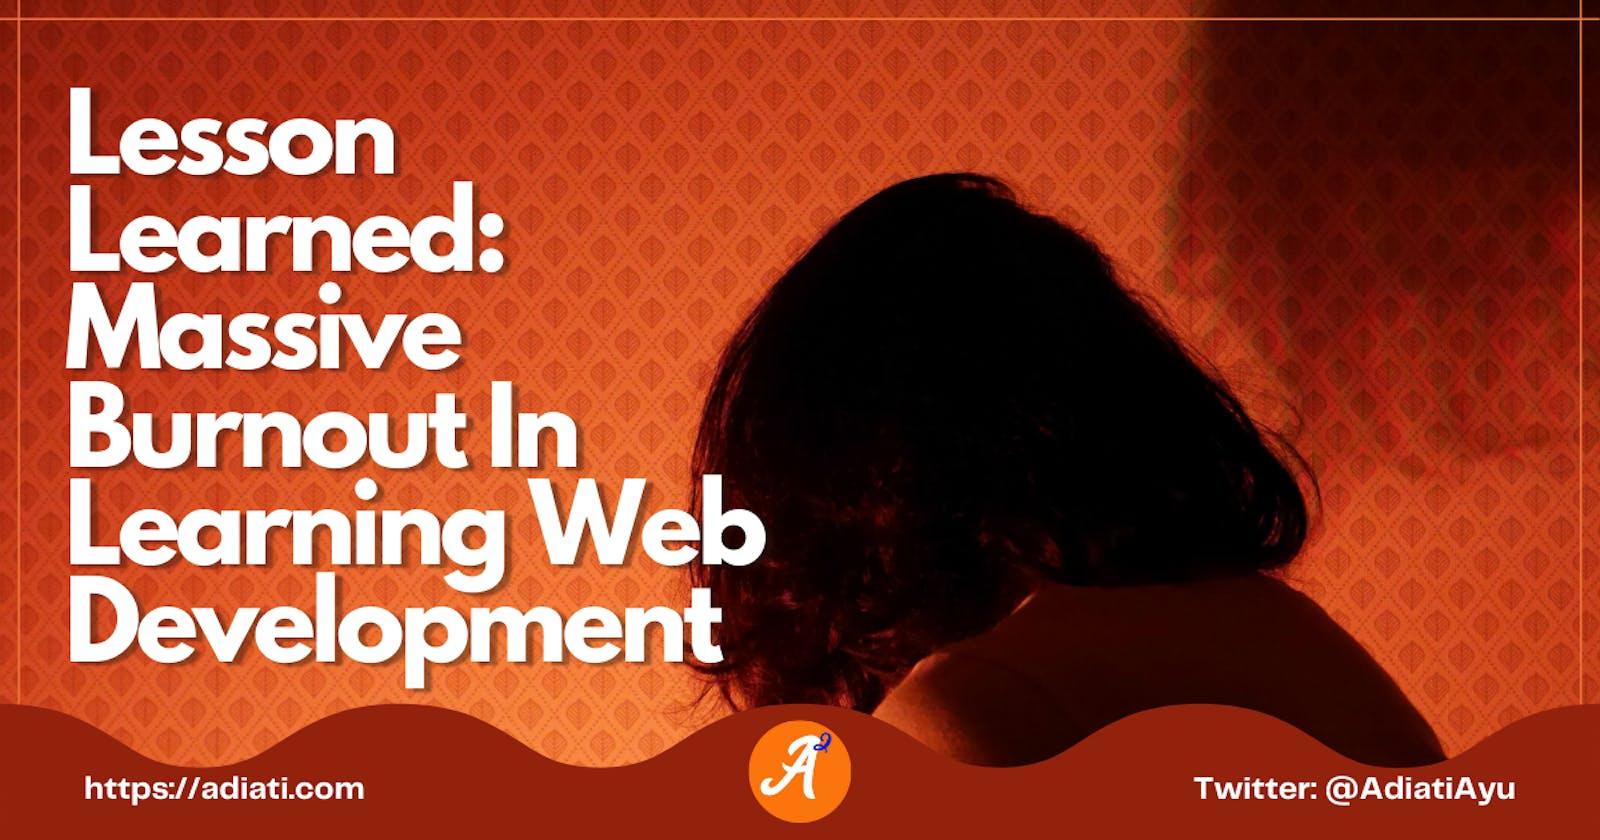 Lesson Learned: Massive Burnout In Learning Web Development